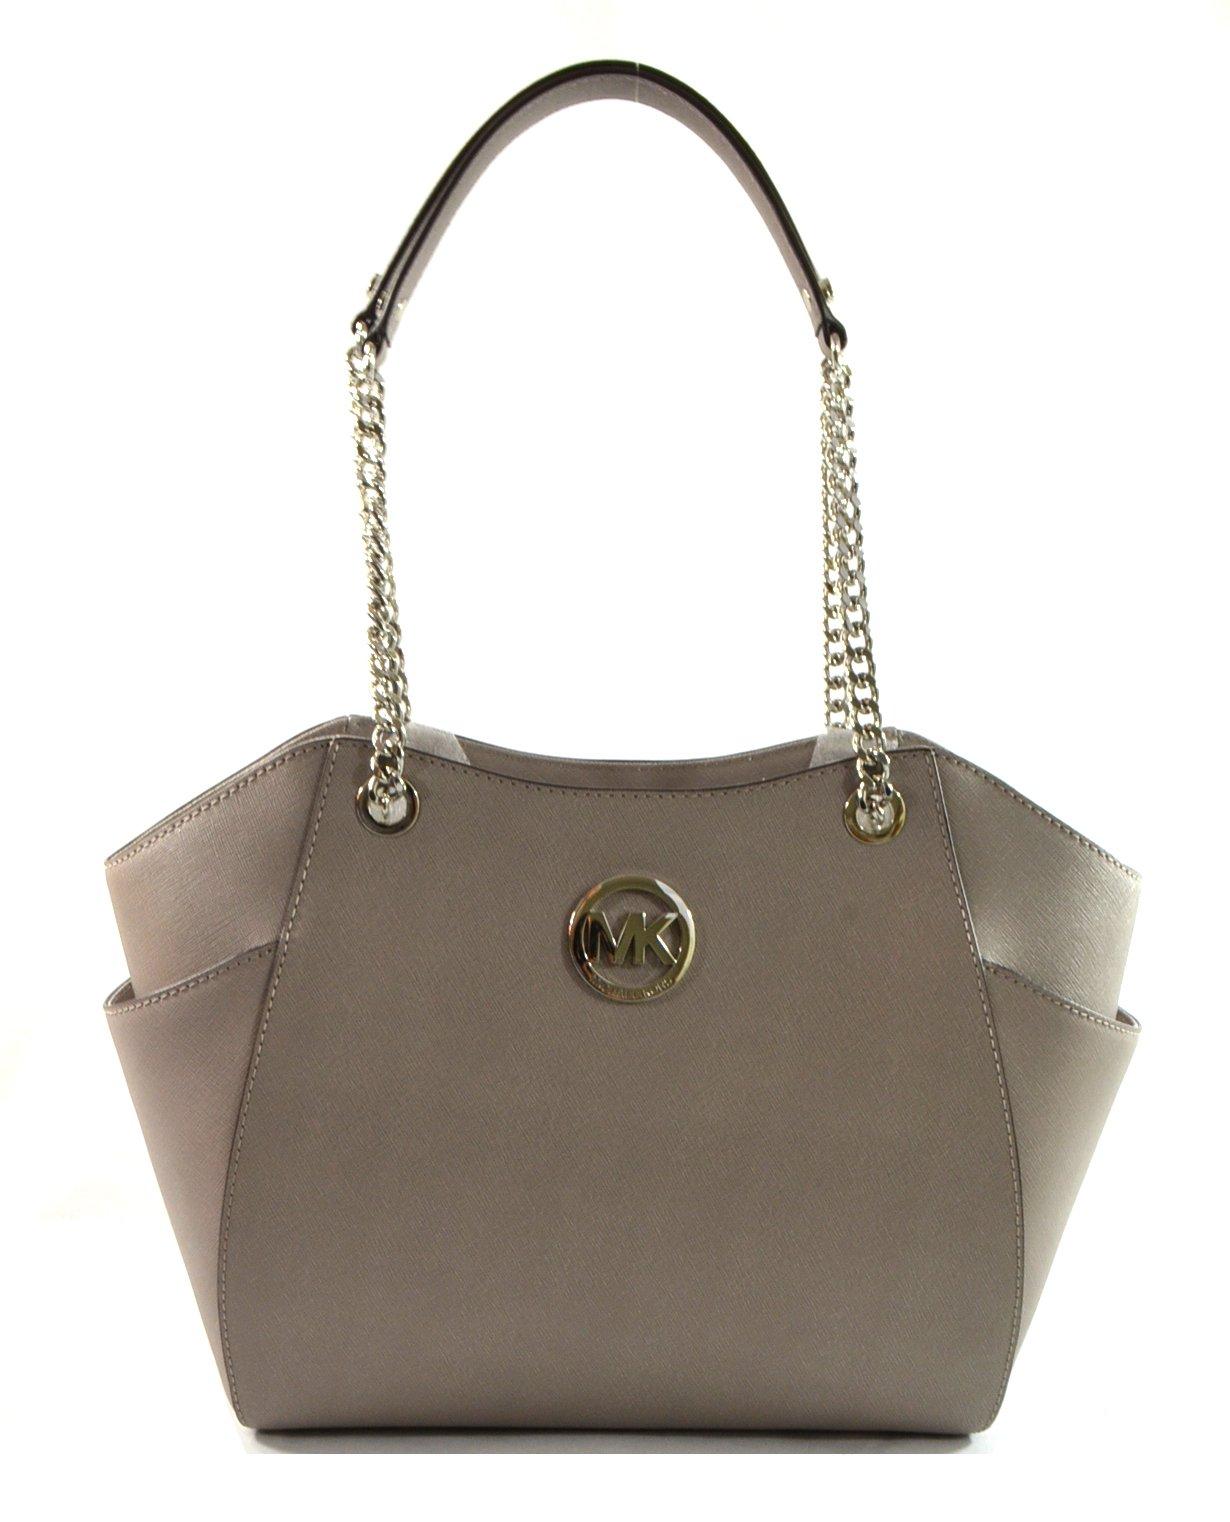 a54b08c4c79ee Galleon - Michael Kors Jet Set Travel Large Chain Shoulder Tote Handbag Pearl  Grey